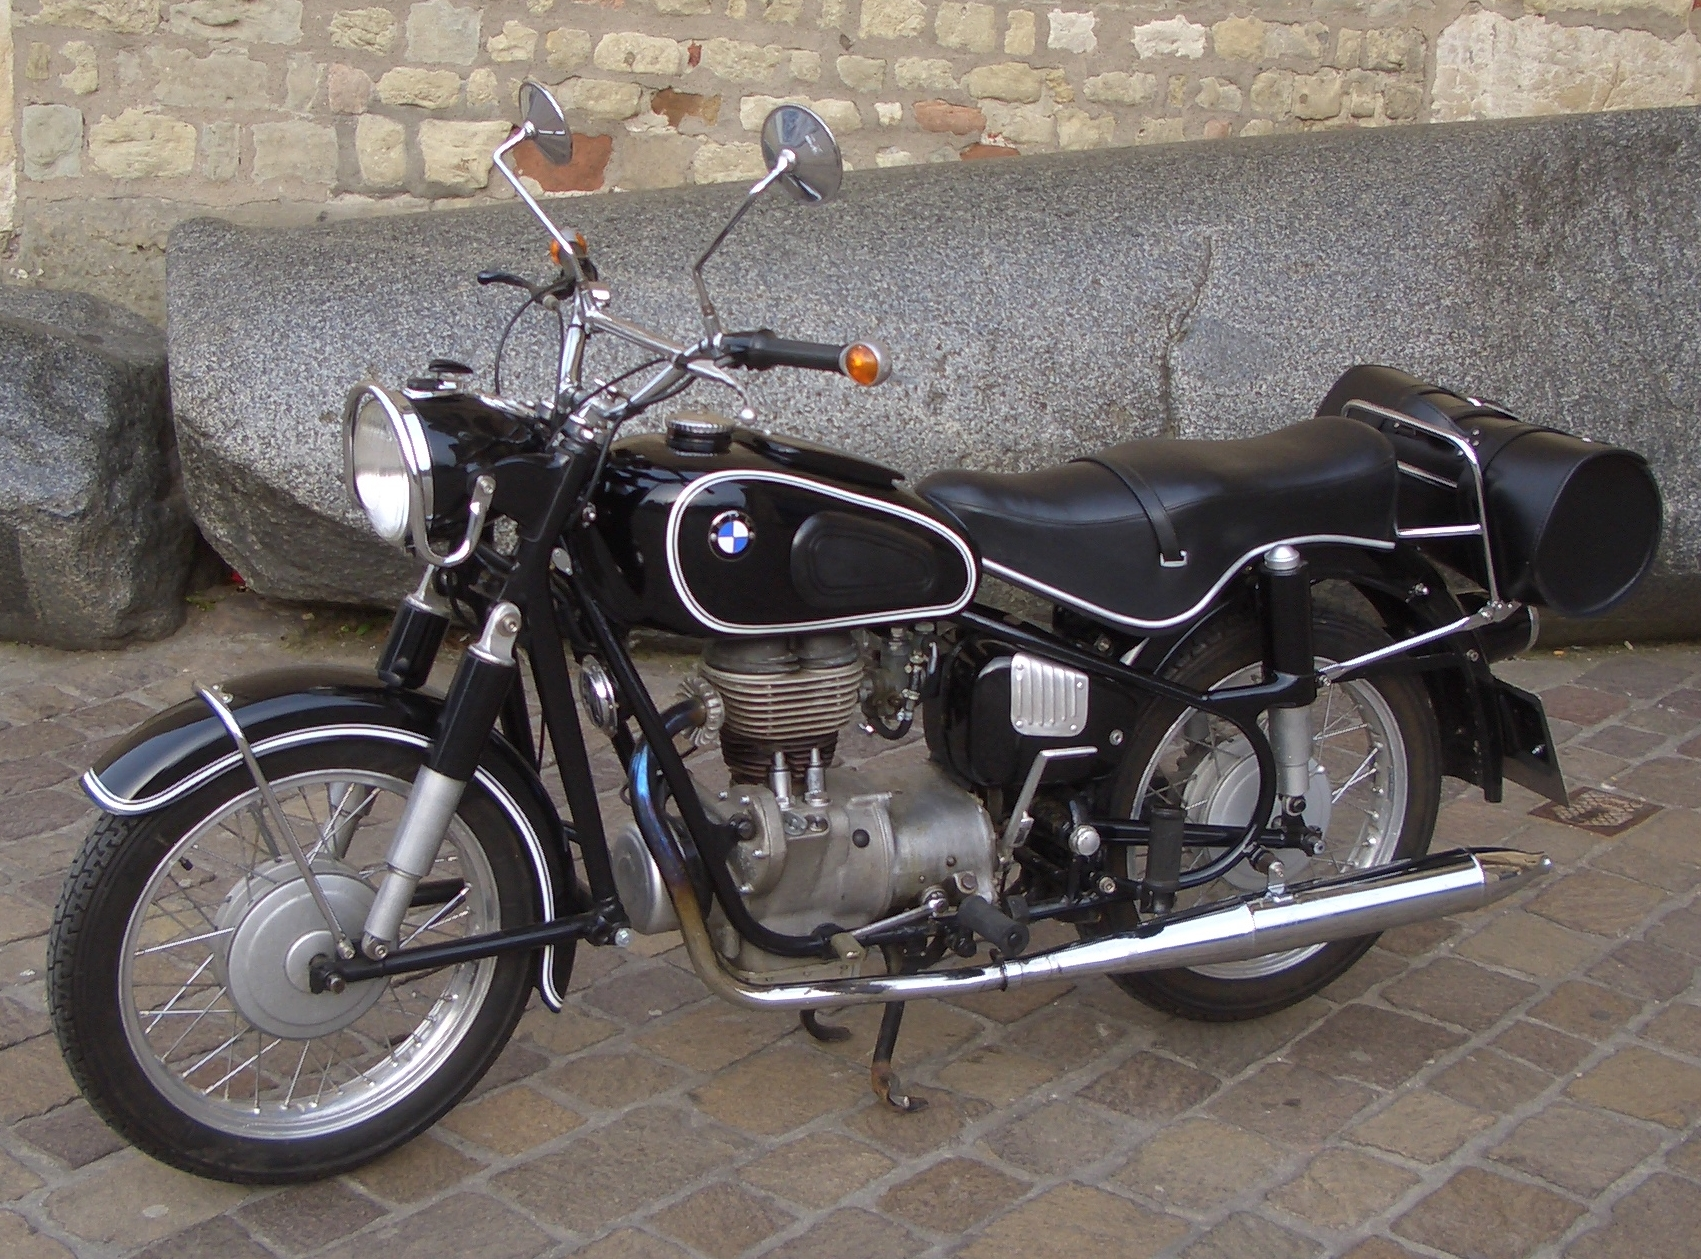 Cafe Racer Motorrad Handschuhe Rindleder Gef Ef Bf Bdttert Handschuhe